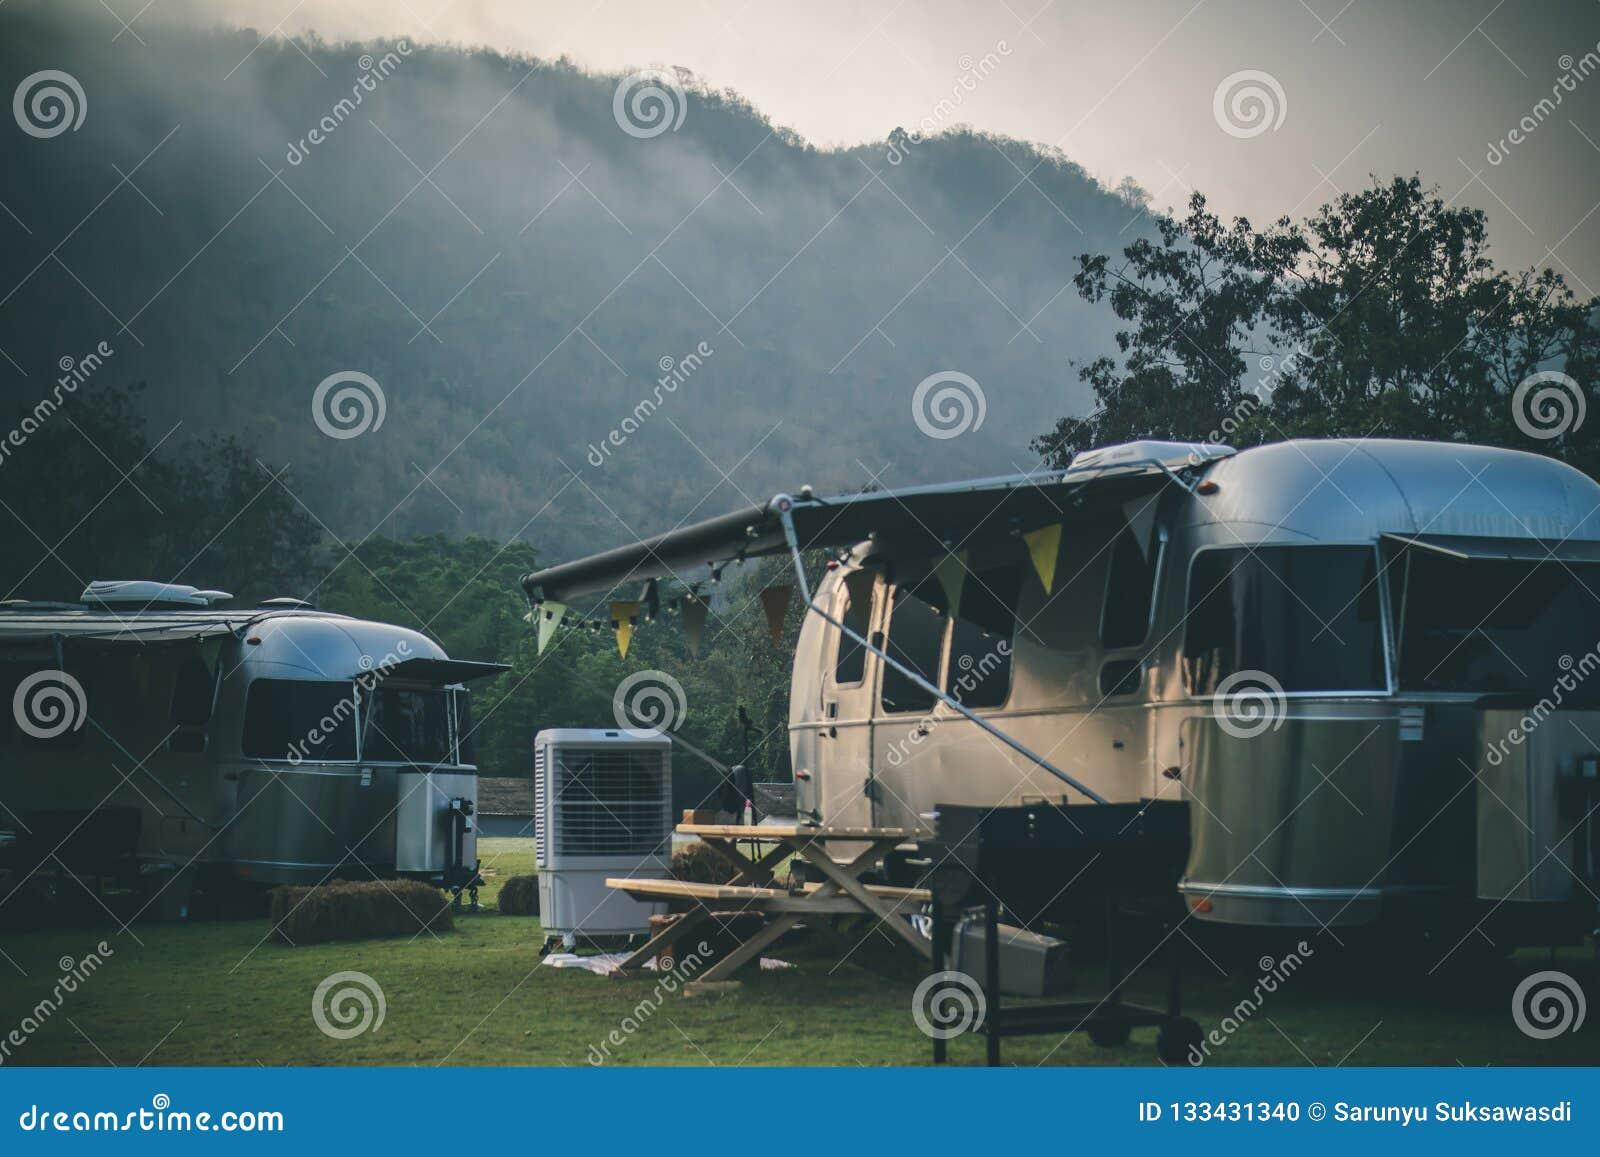 Caravan camping campsite stock photo  Image of camp - 133431340